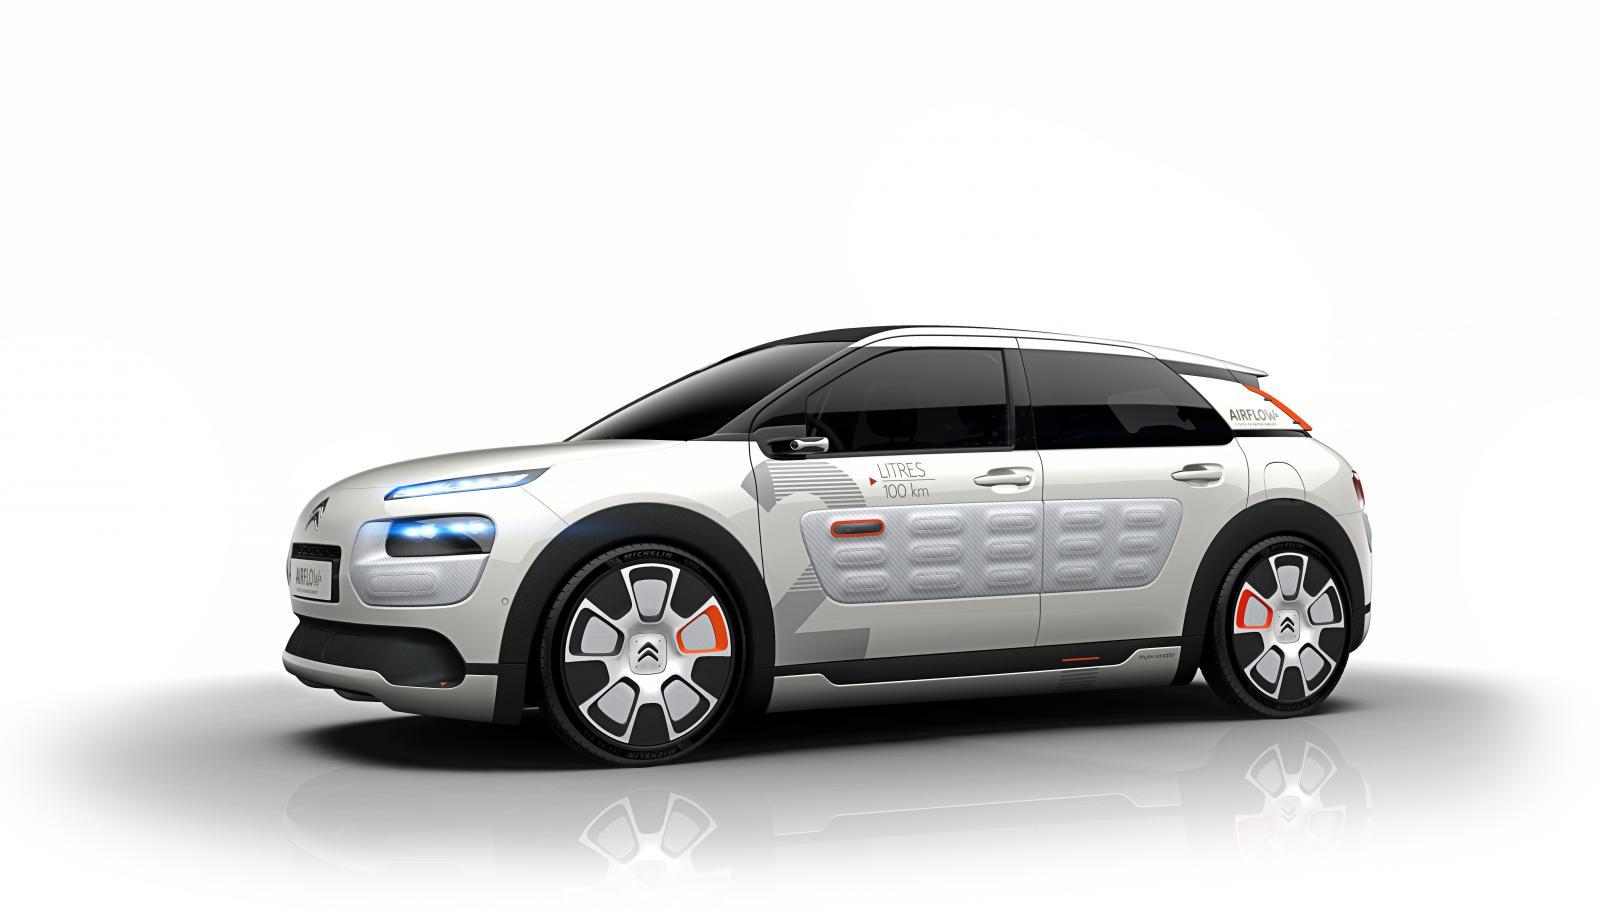 Concept-Car C4 Cactus Airflow 2014 3/4 avant